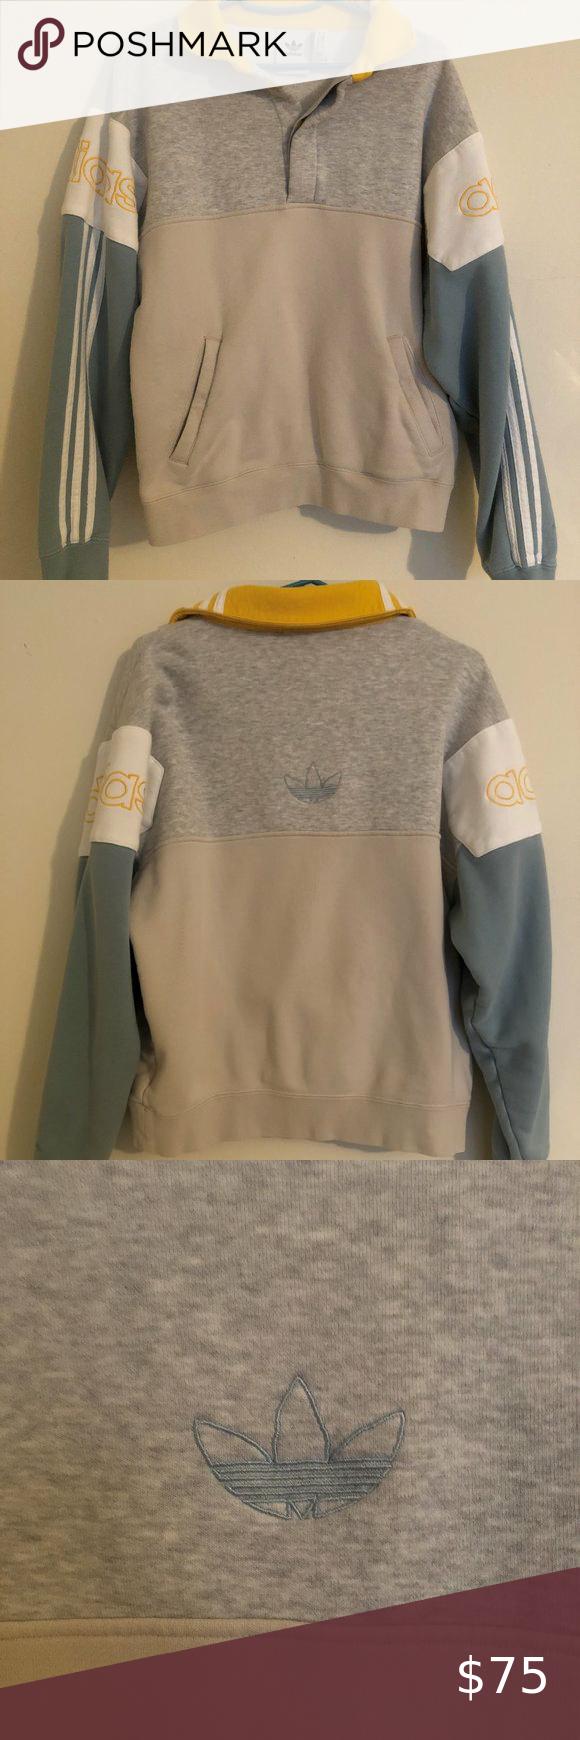 Adidas Colorblock Rugby Sweatshirt Sweatshirts Adidas Sweater Sweaters Crewneck [ 1740 x 580 Pixel ]